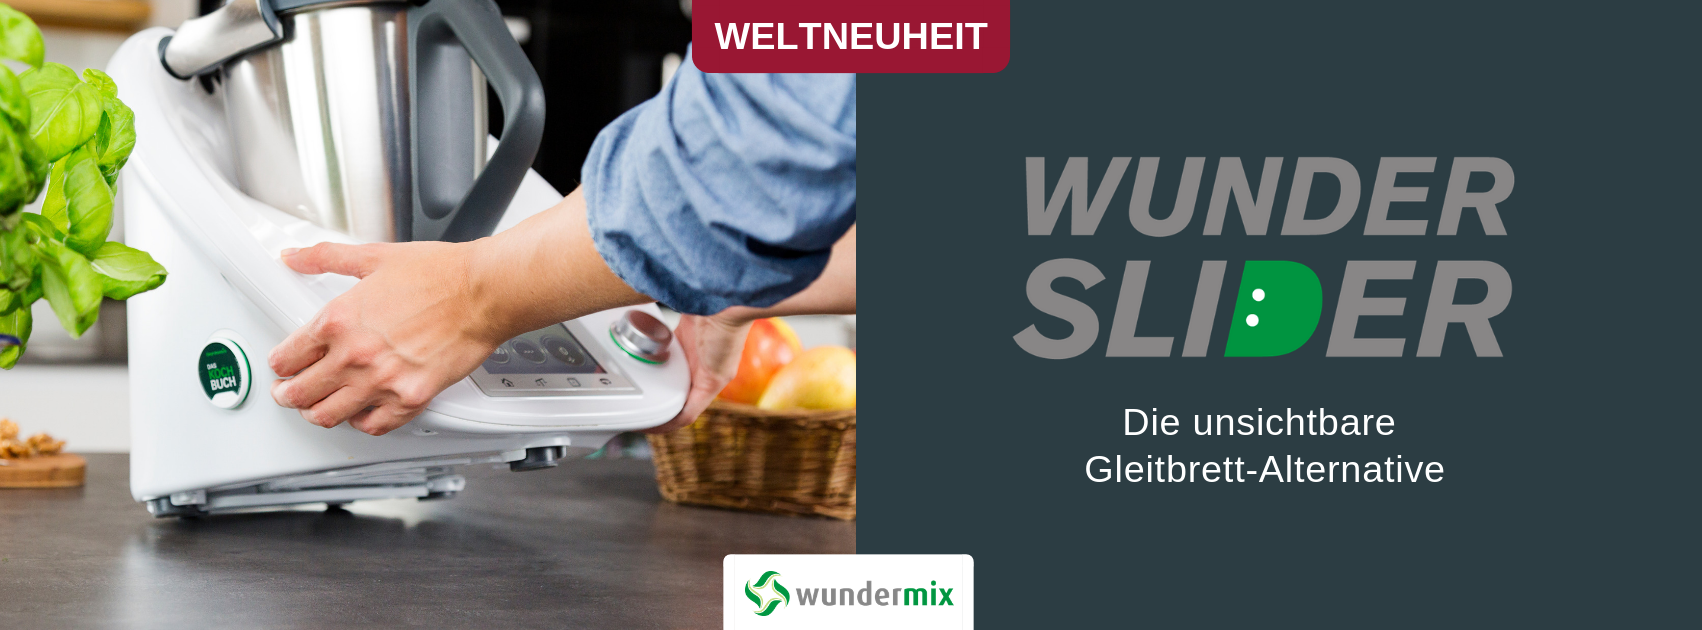 WunderSlider-Shop-HeaderbBb2arn7nrL4f